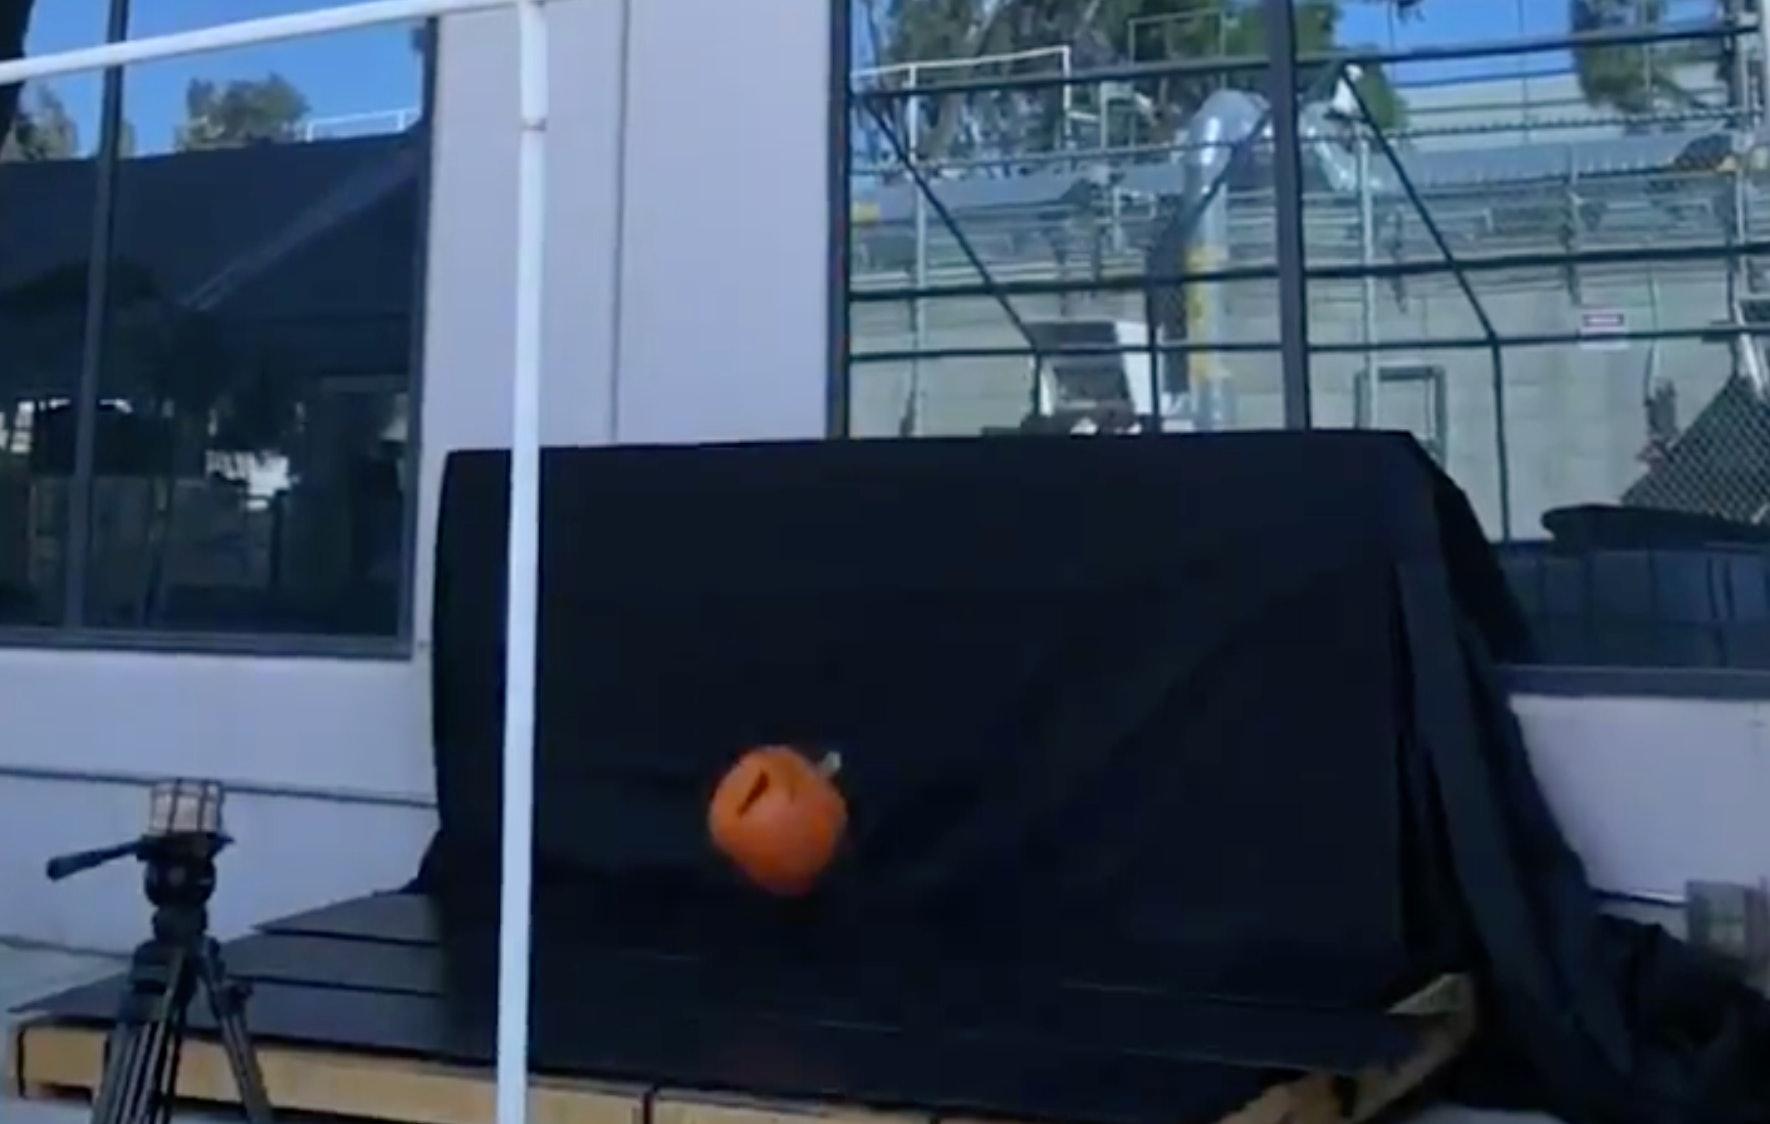 Dropping a pumpkin onto Tesla Solar Roof.